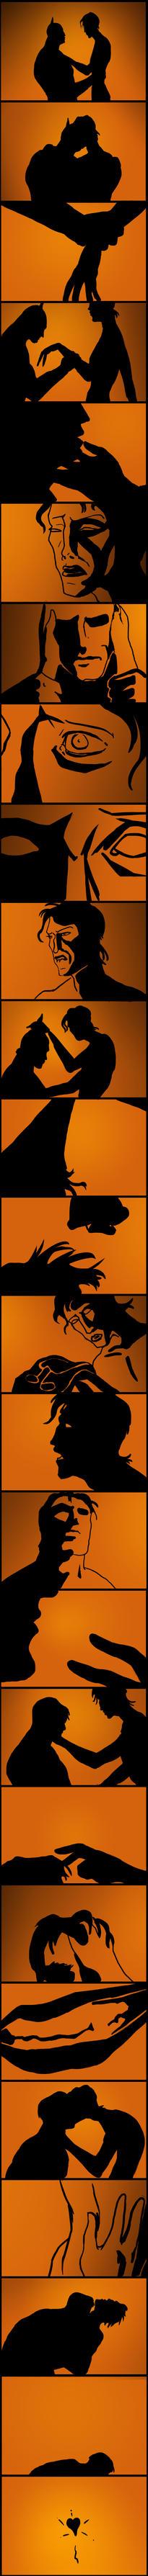 Firelight by tormentedshadow